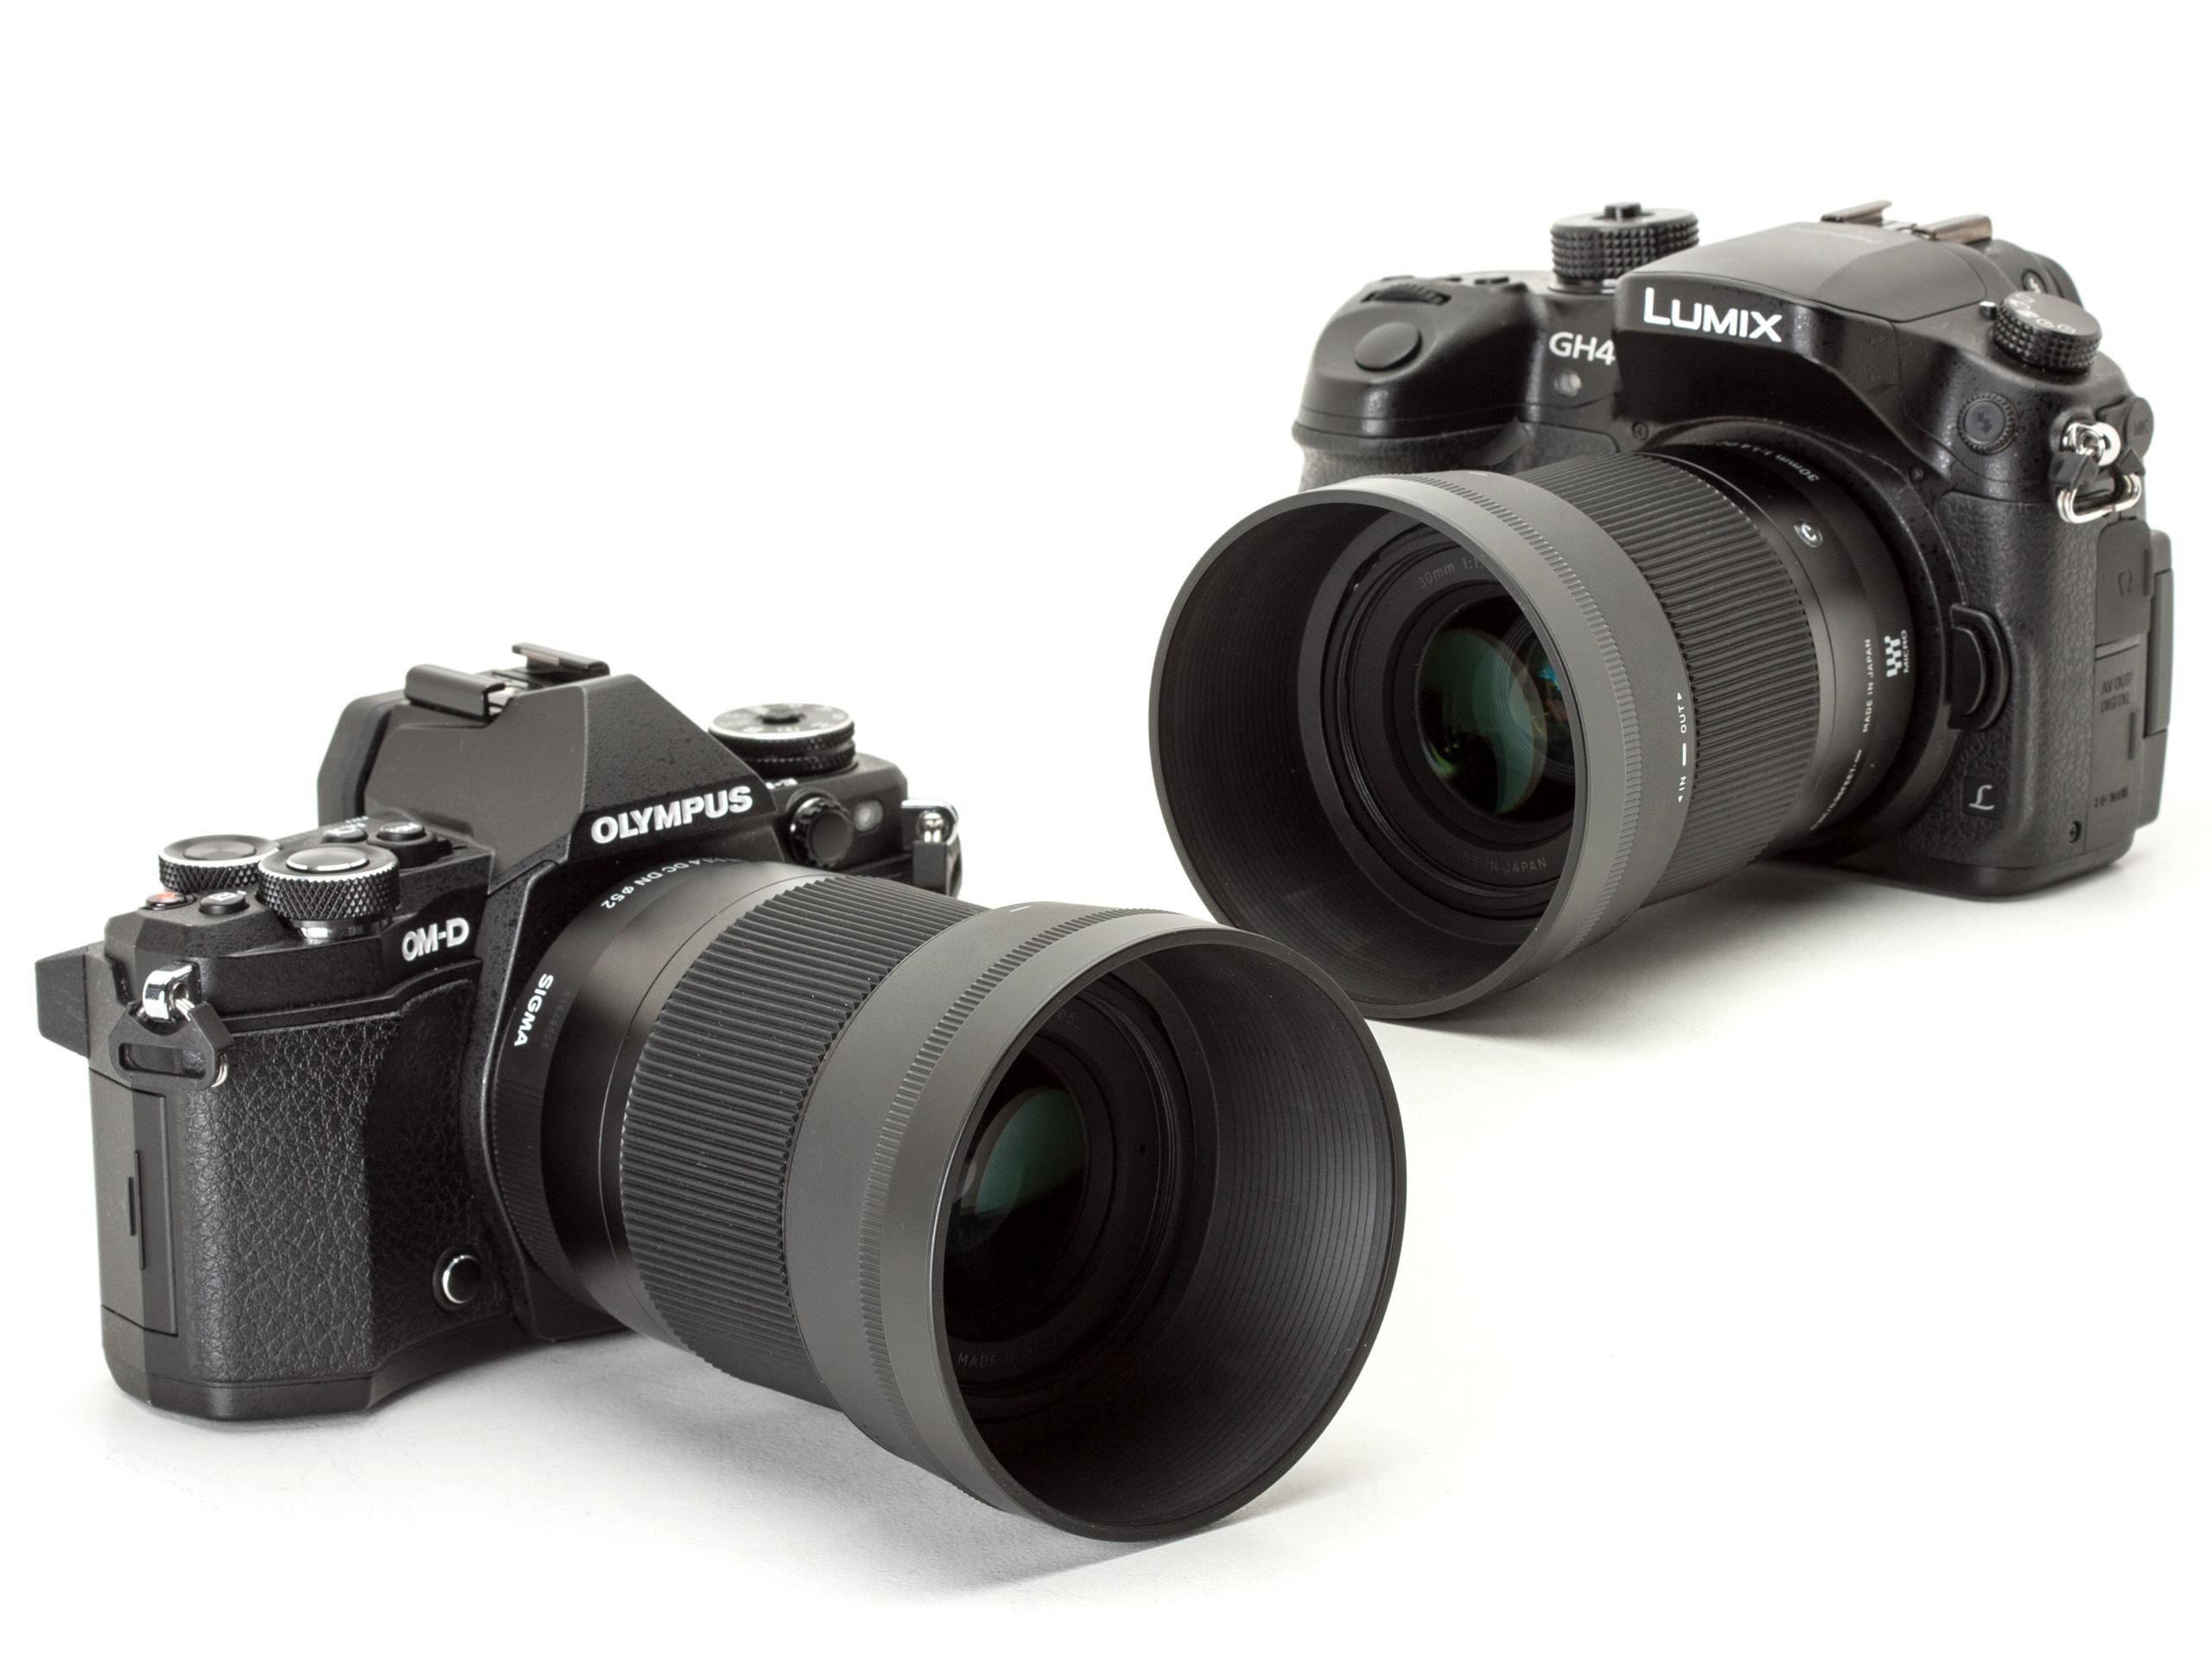 Sigma 30mm F14 Dc Dn Contemporary Micro Four Thirds Lens Review Panasonic Leica Dg Summilux 25mm F 14 Asph 4 3 Digital Photography